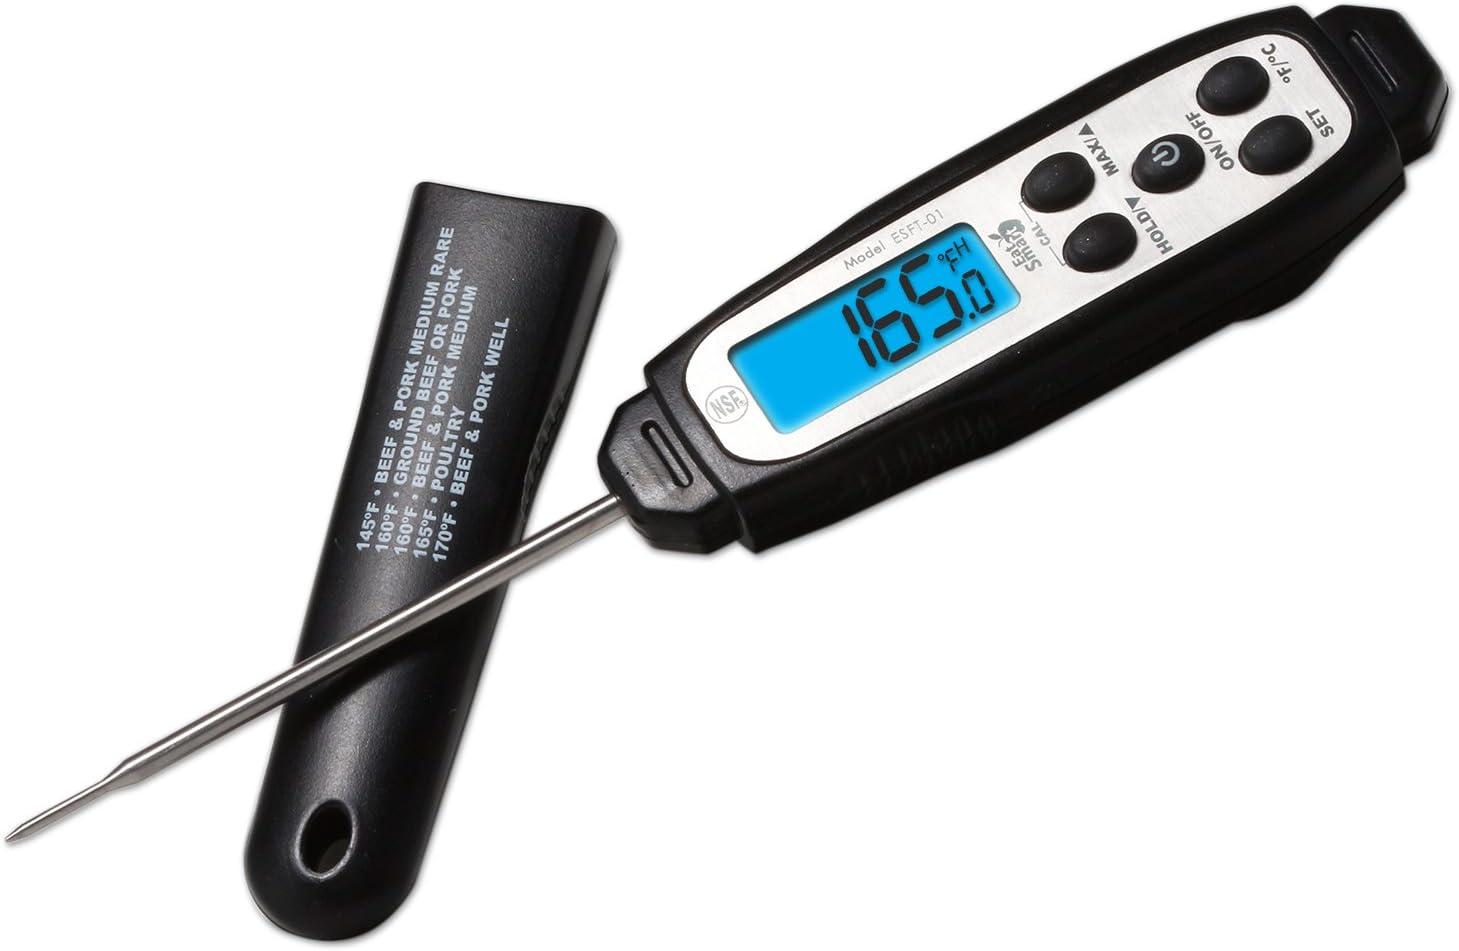 EatSmart ESFT-01 Precision Digital Thermometer